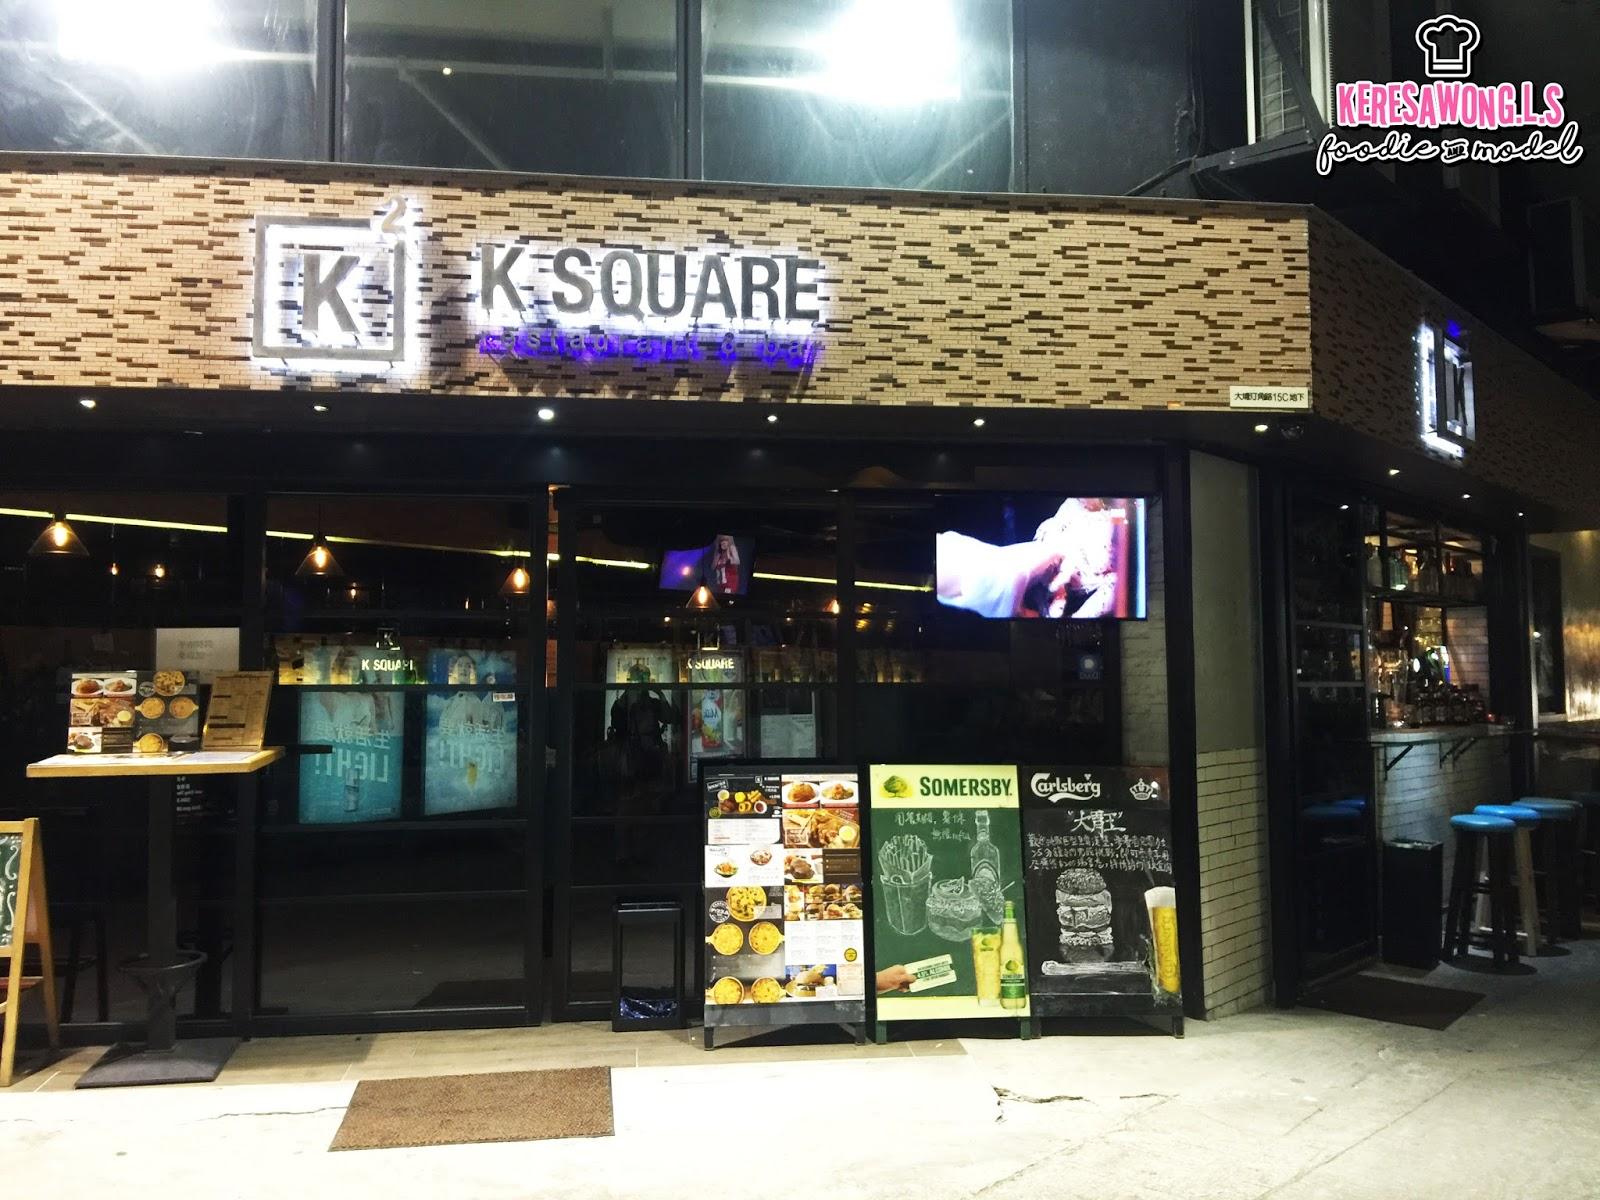 Keresa Wong.L.S: 大埔【K Square Restaurant & Bar 】驚喜難忘的 K Square 德國咸豬手